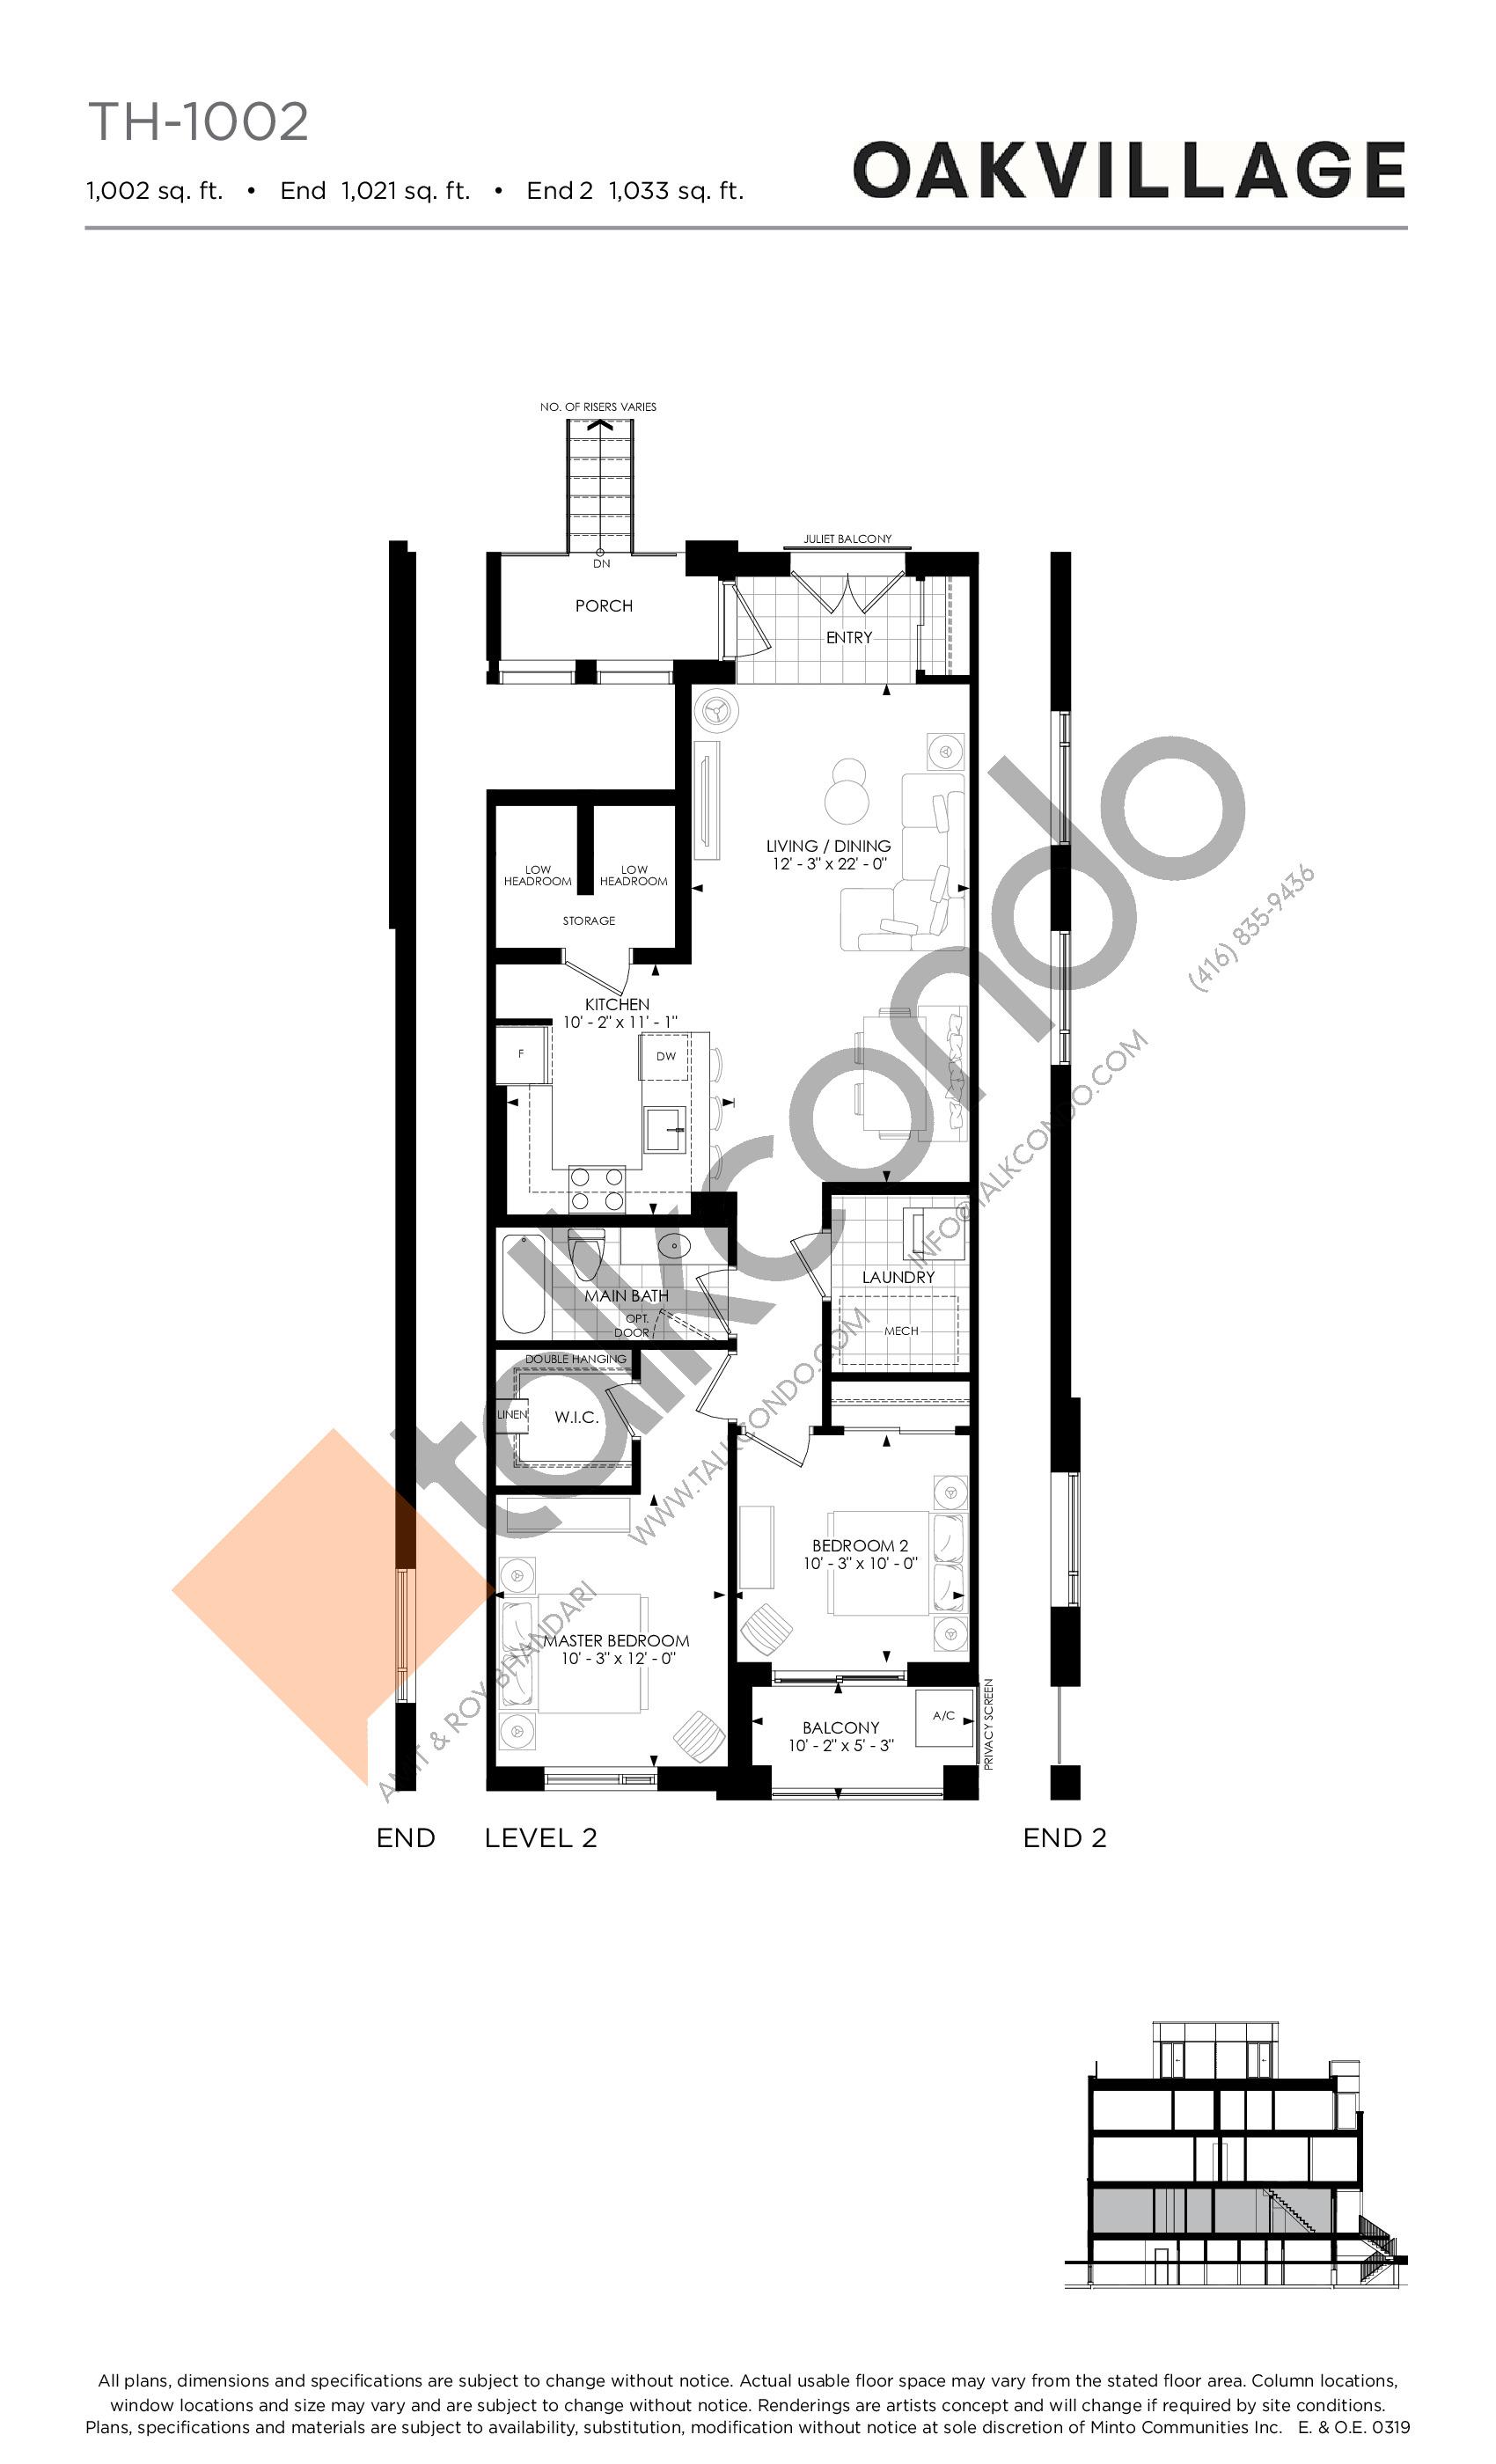 TH-1002 Floor Plan at Minto Oakvillage Condos 1 - 1002 sq.ft